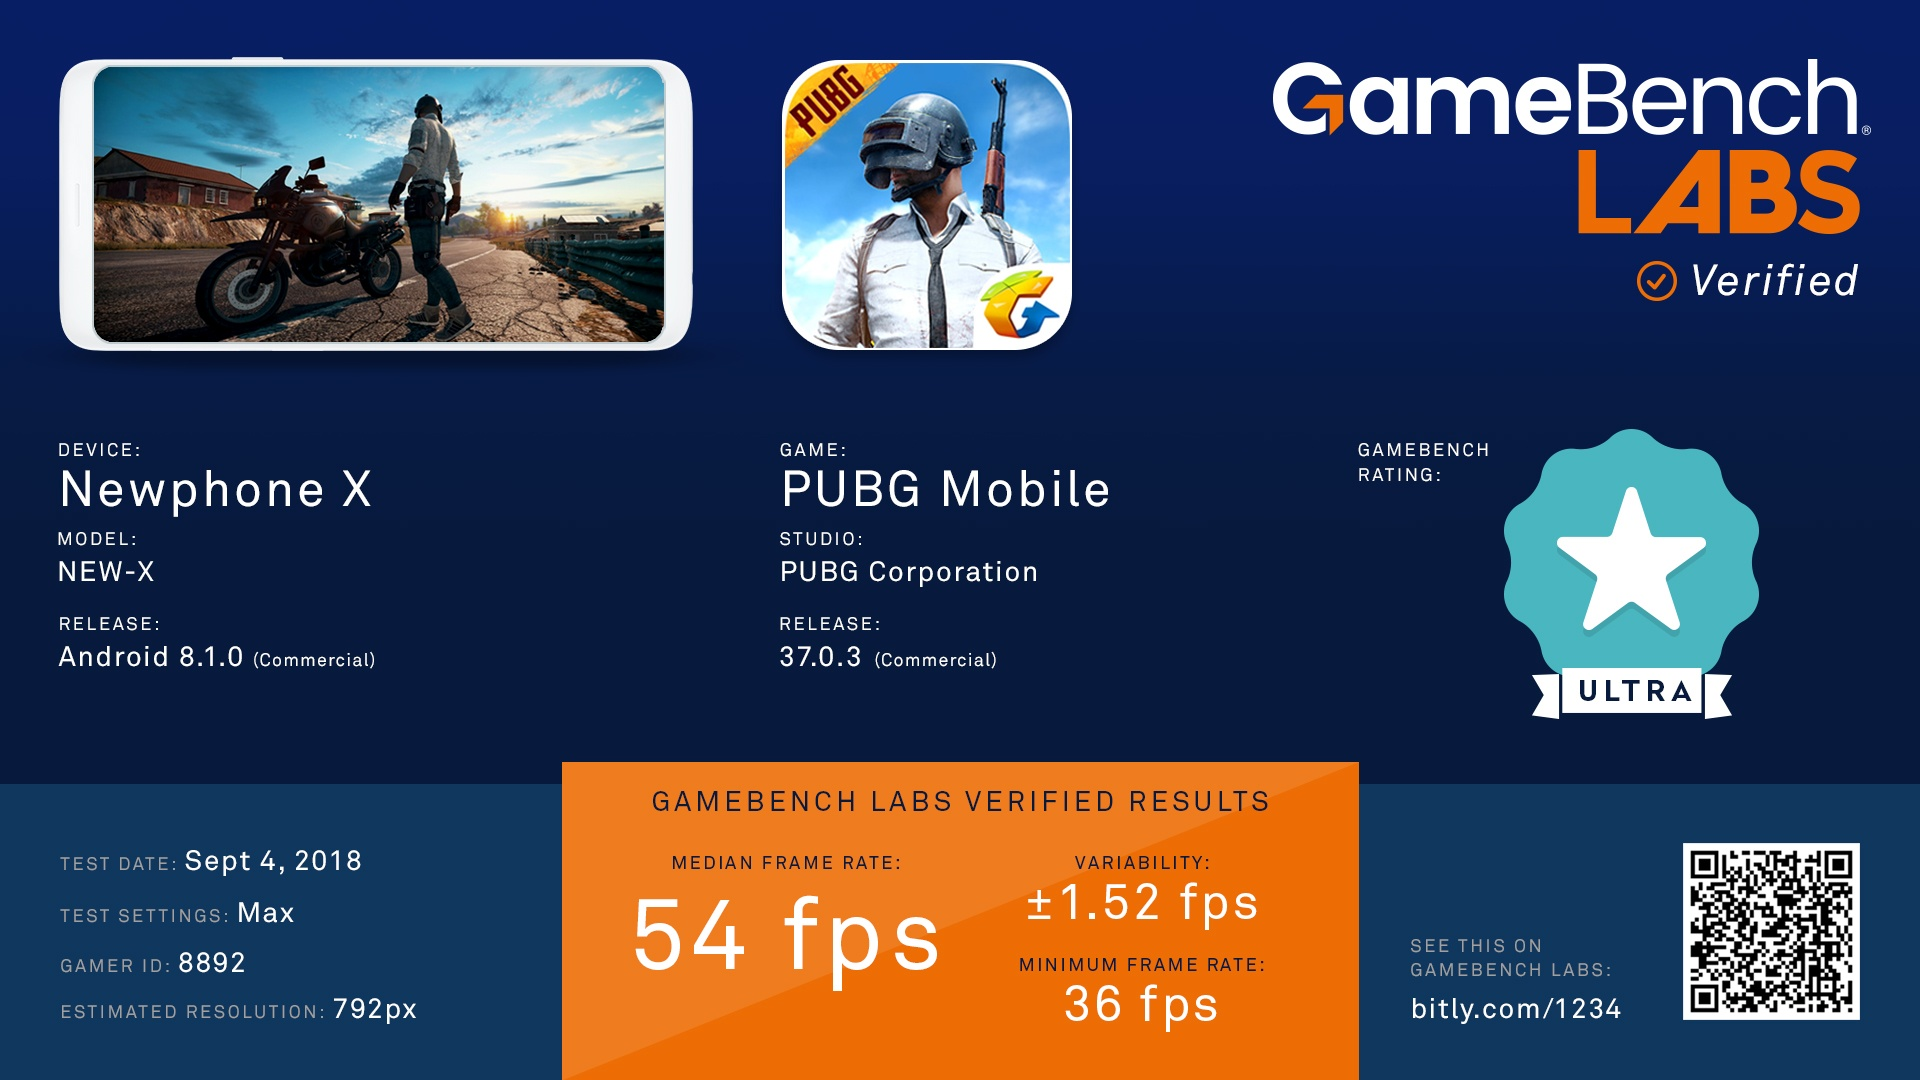 2385-Gamebench-ResultsCard-Card1-04